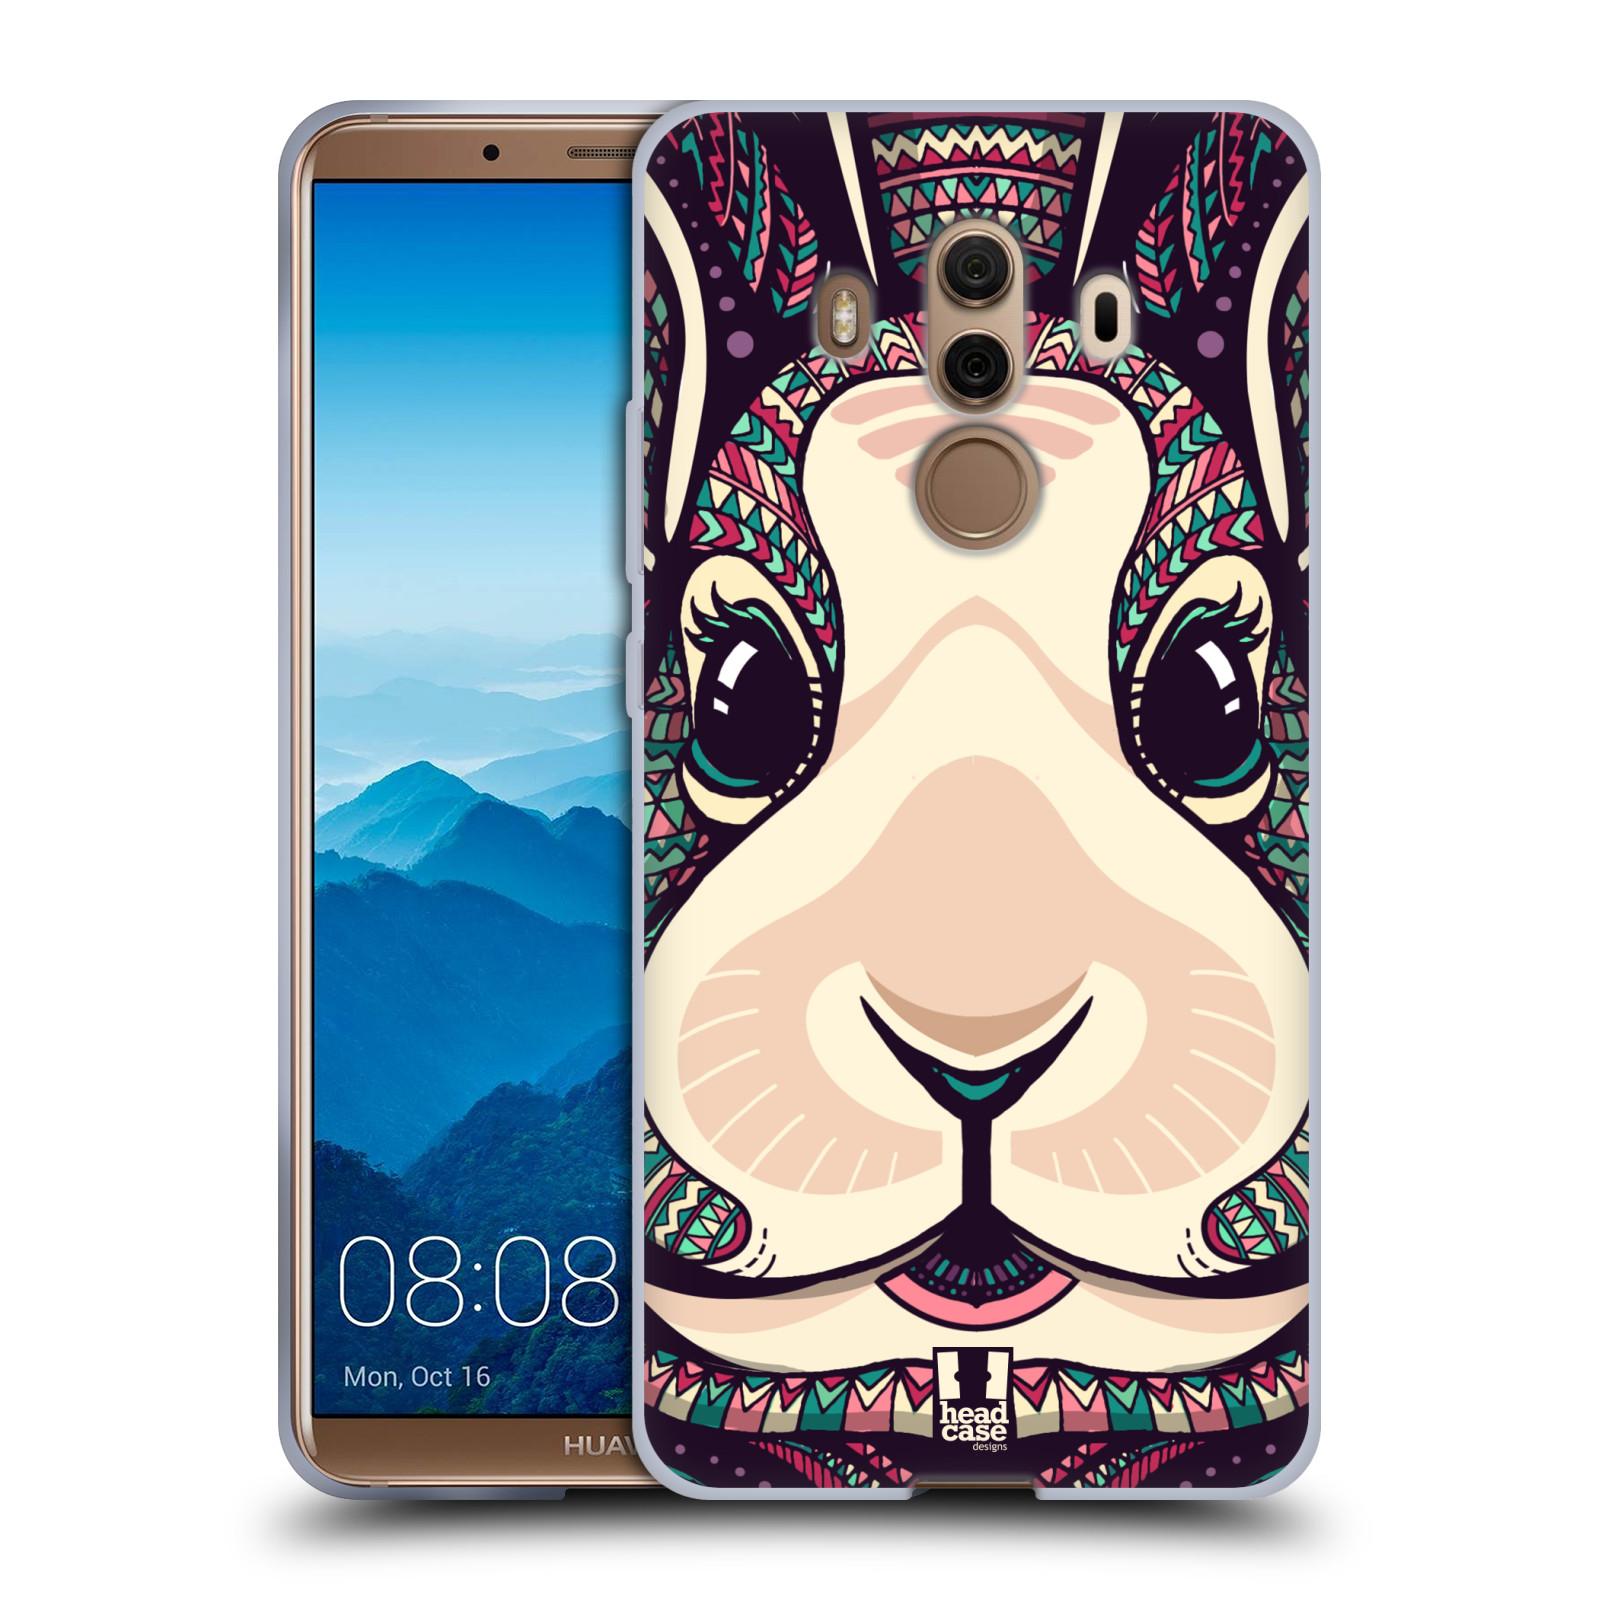 Silikonové pouzdro na mobil Huawei Mate 10 Pro - Head Case - AZTEC ZAJÍČEK